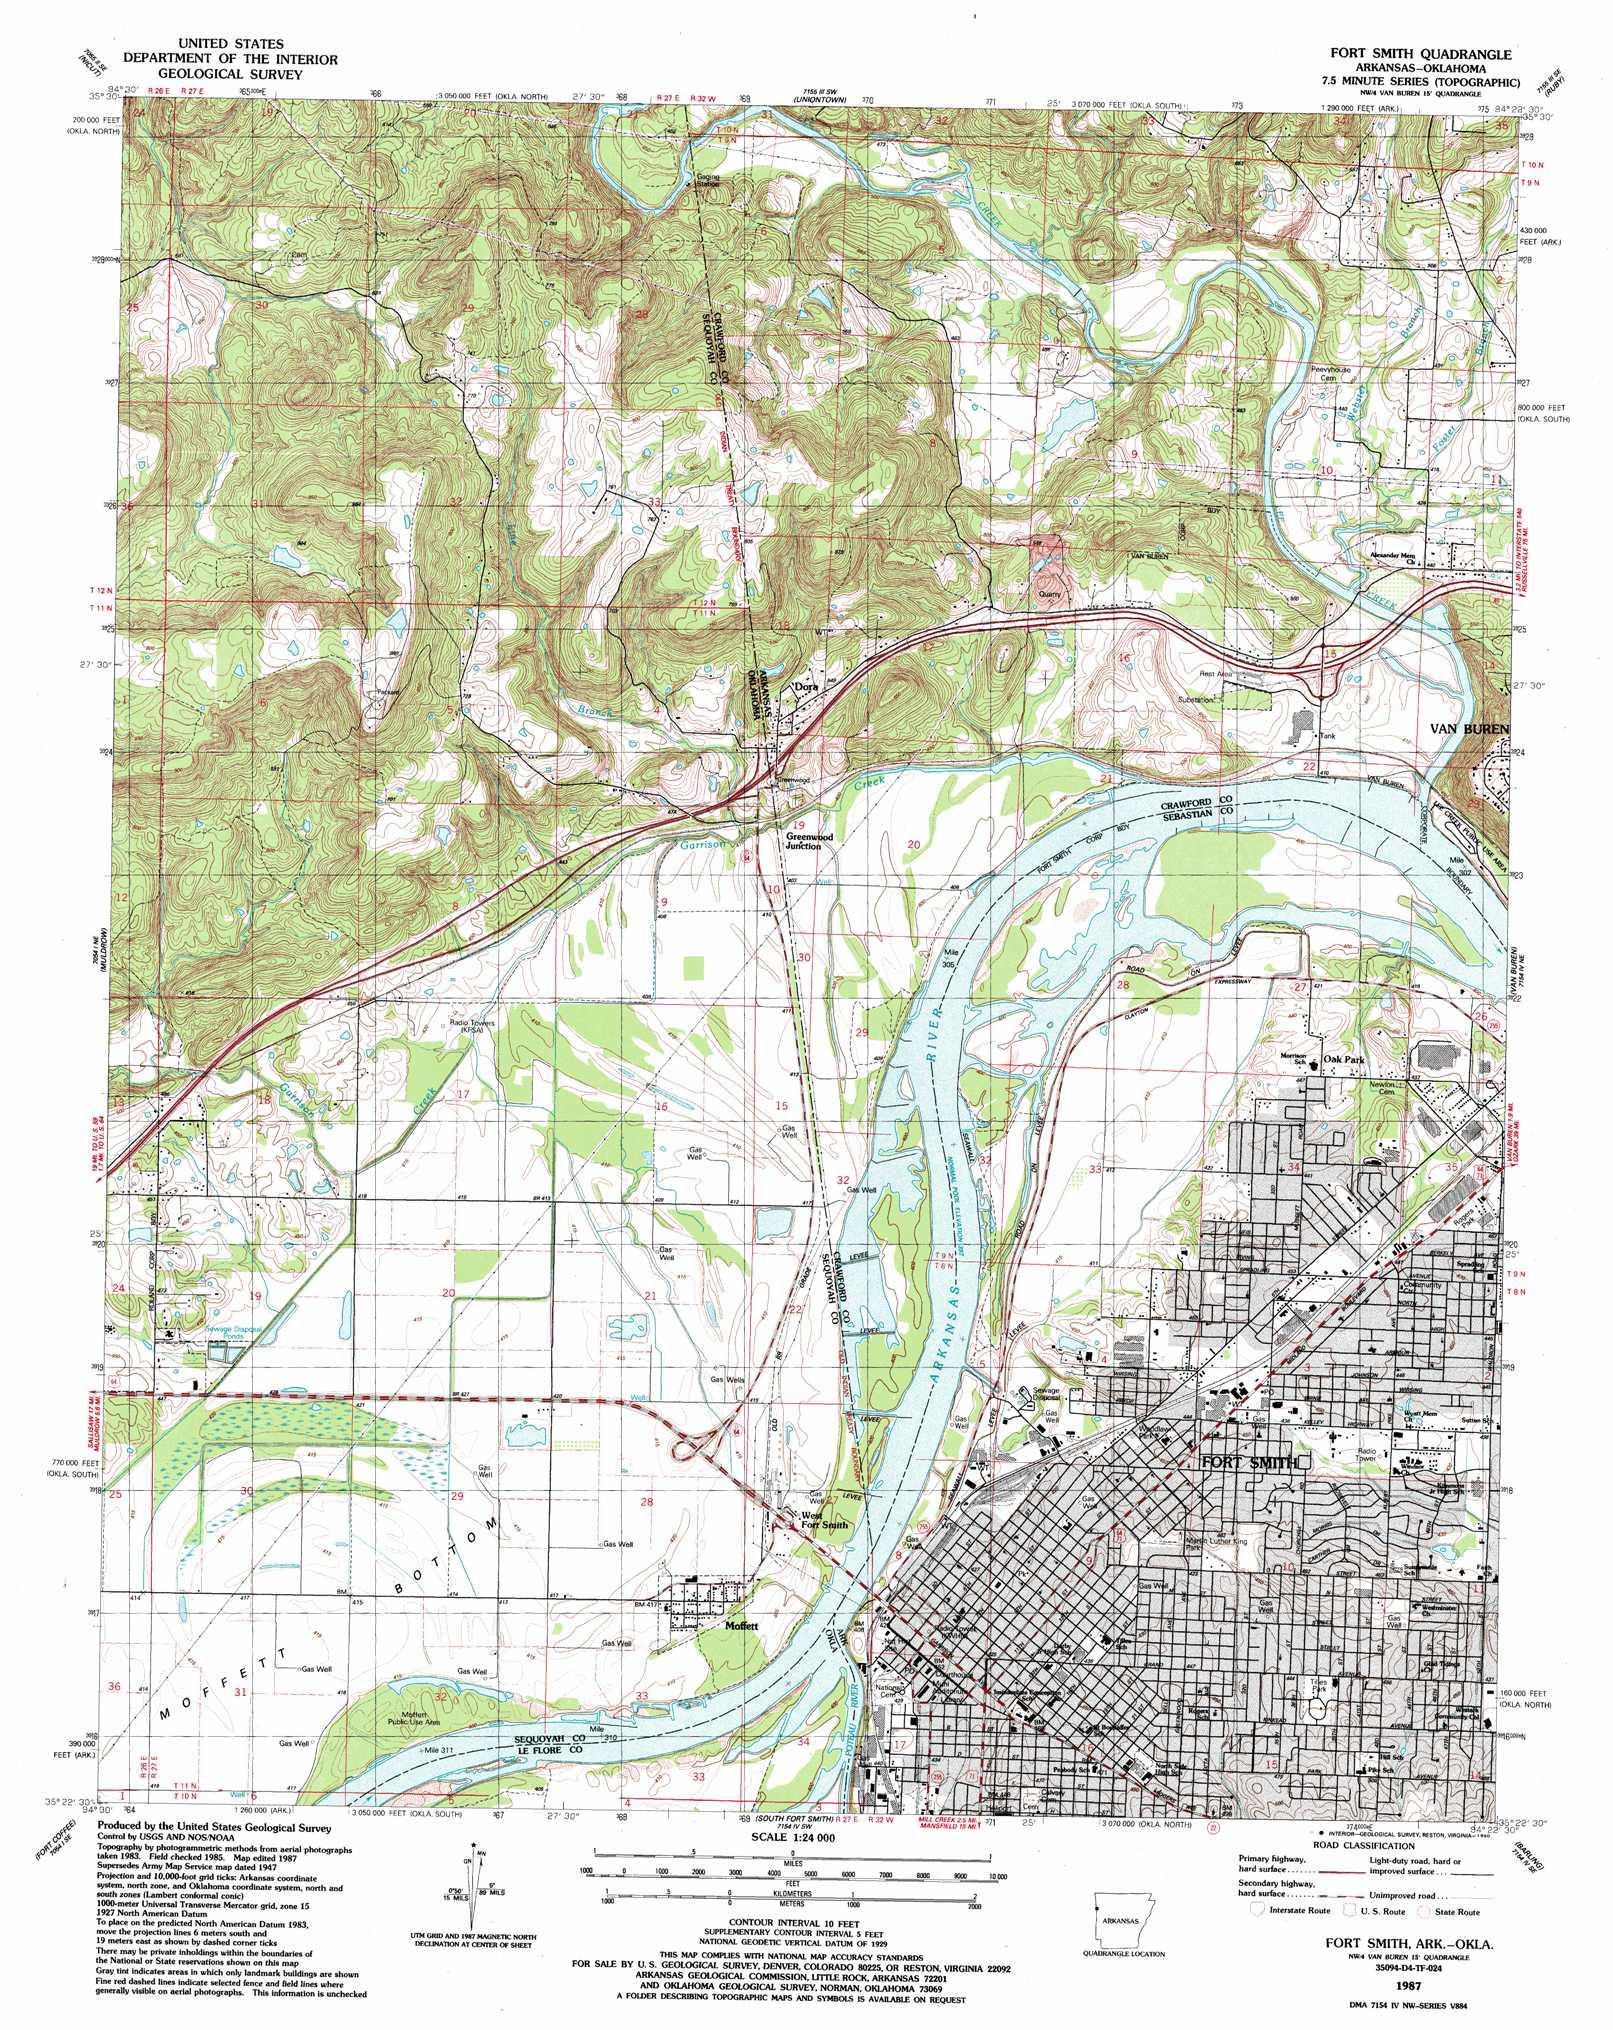 Fort Smith topographic map, AR, OK - USGS Topo Quad 35094d4